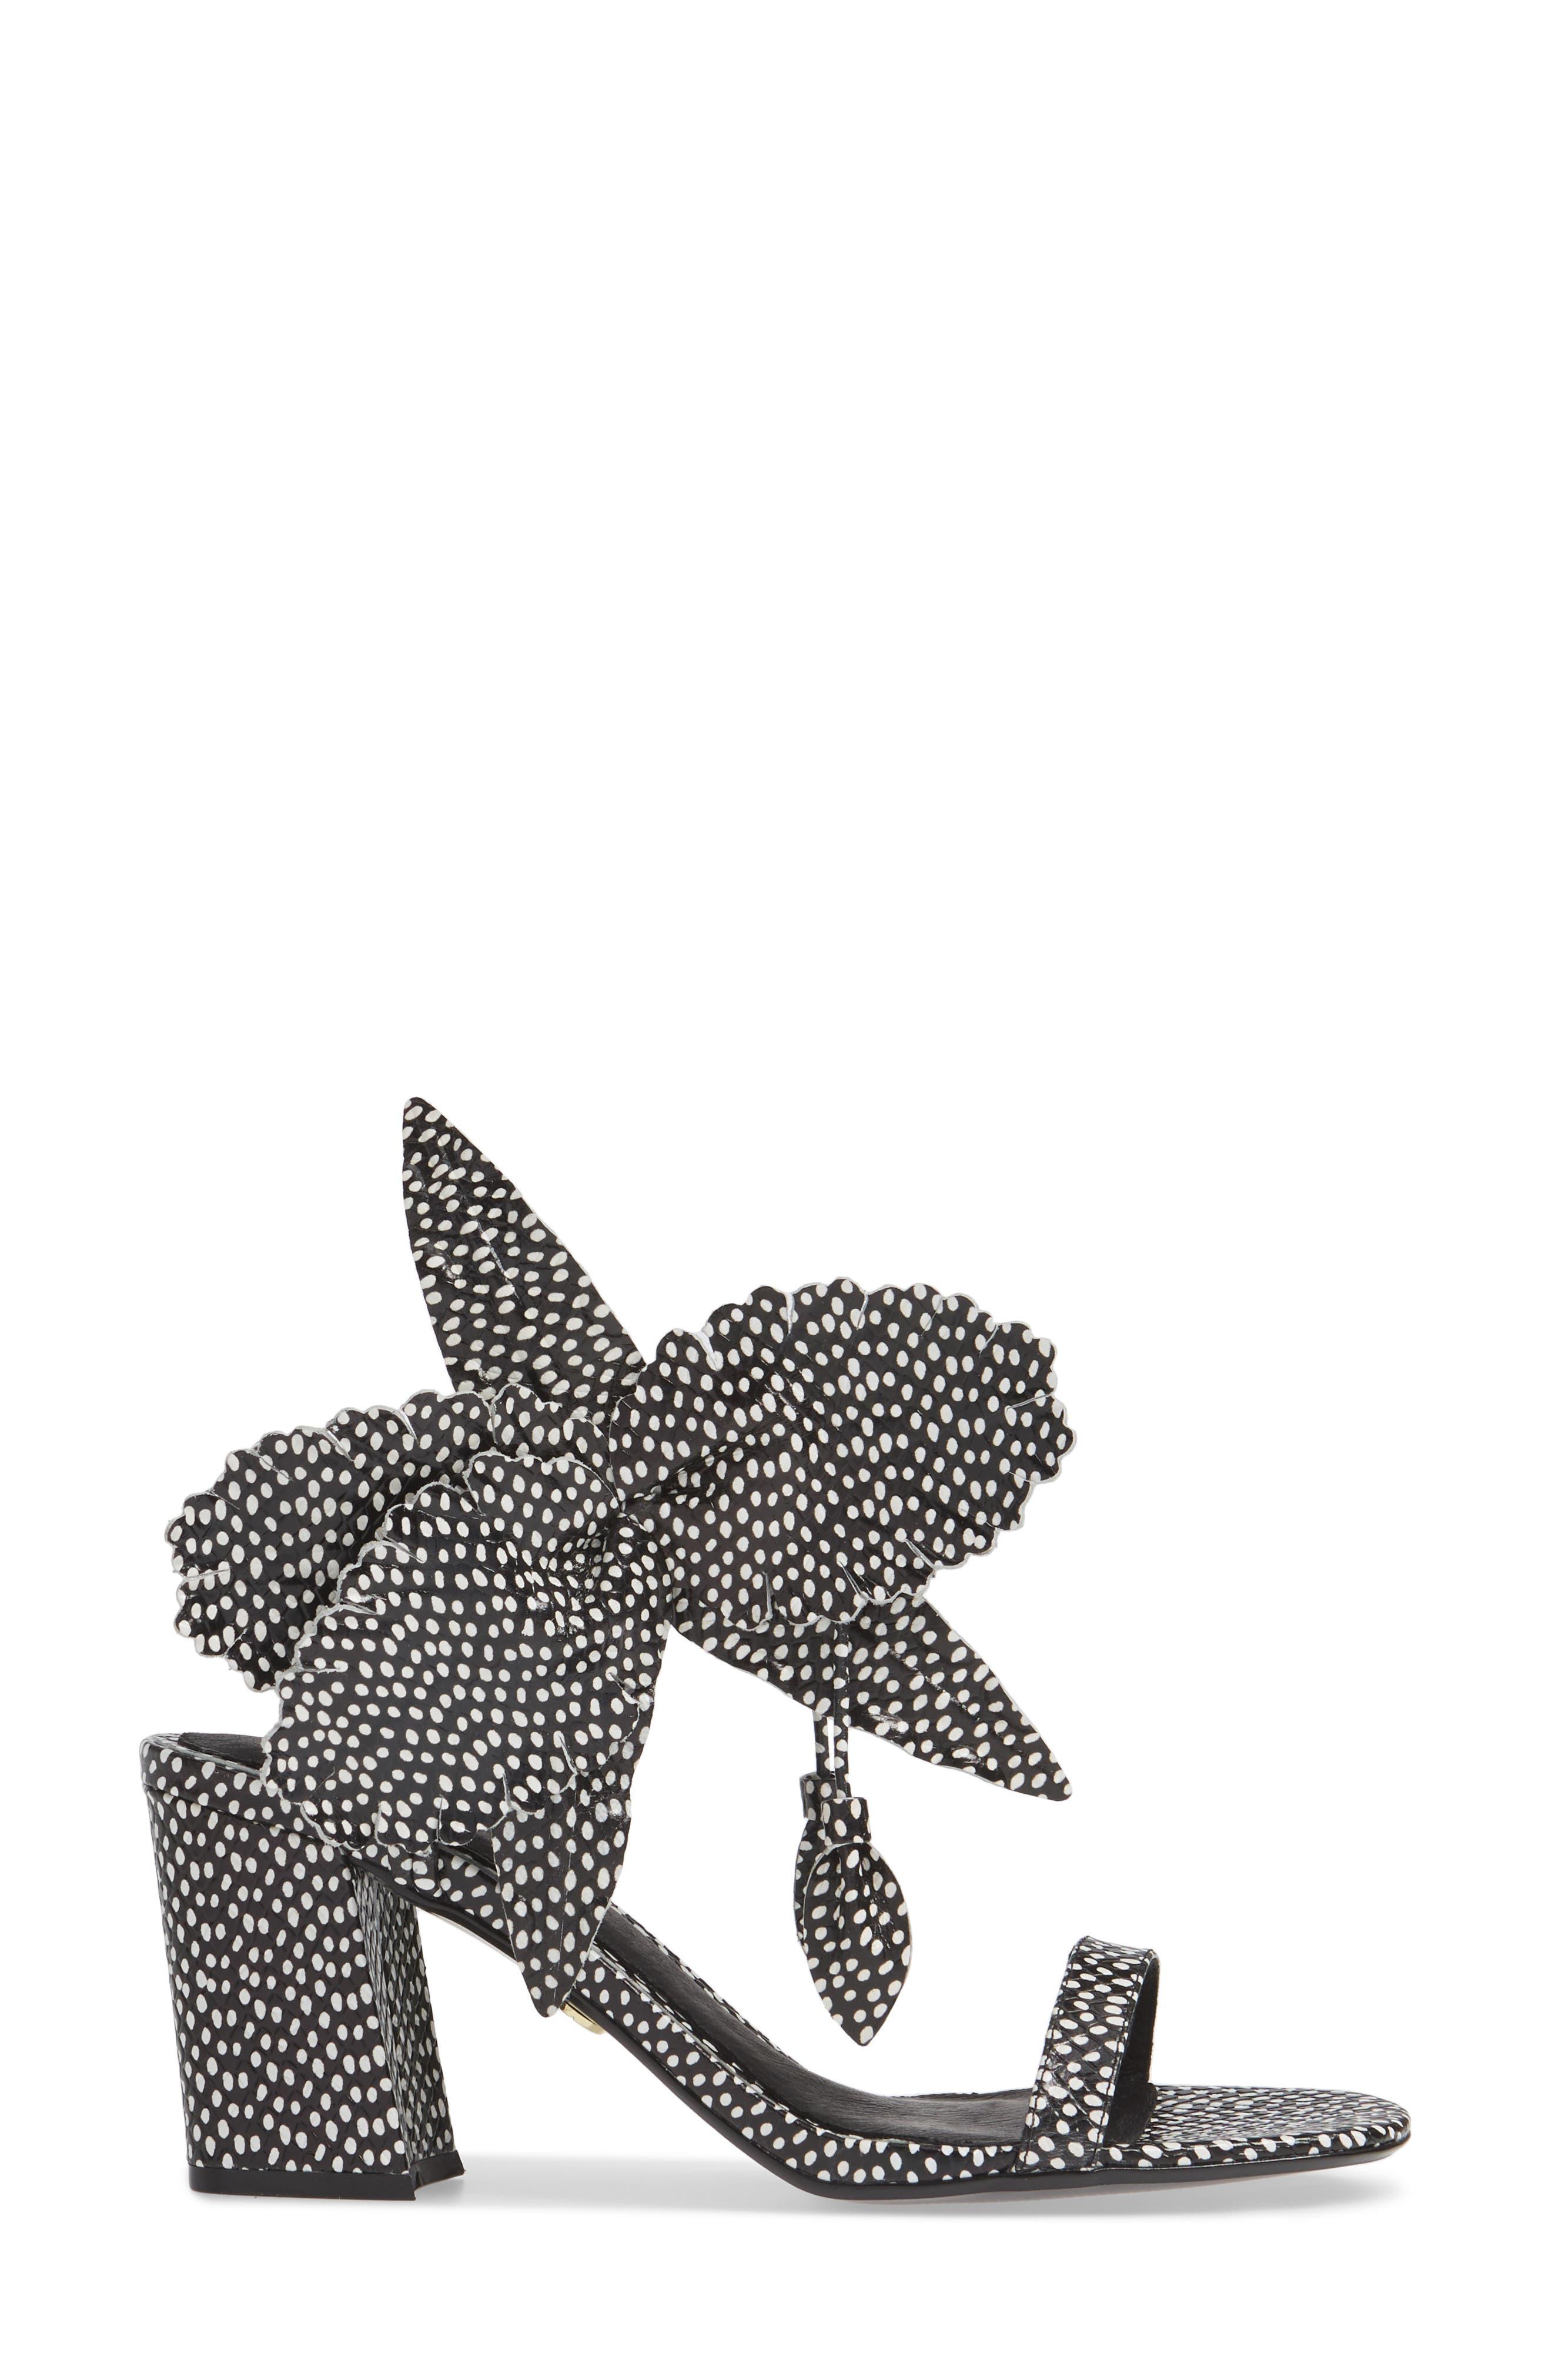 CECELIA NEW YORK,                             Hibiscus Sandal,                             Alternate thumbnail 3, color,                             BLACK AND WHITE DOT